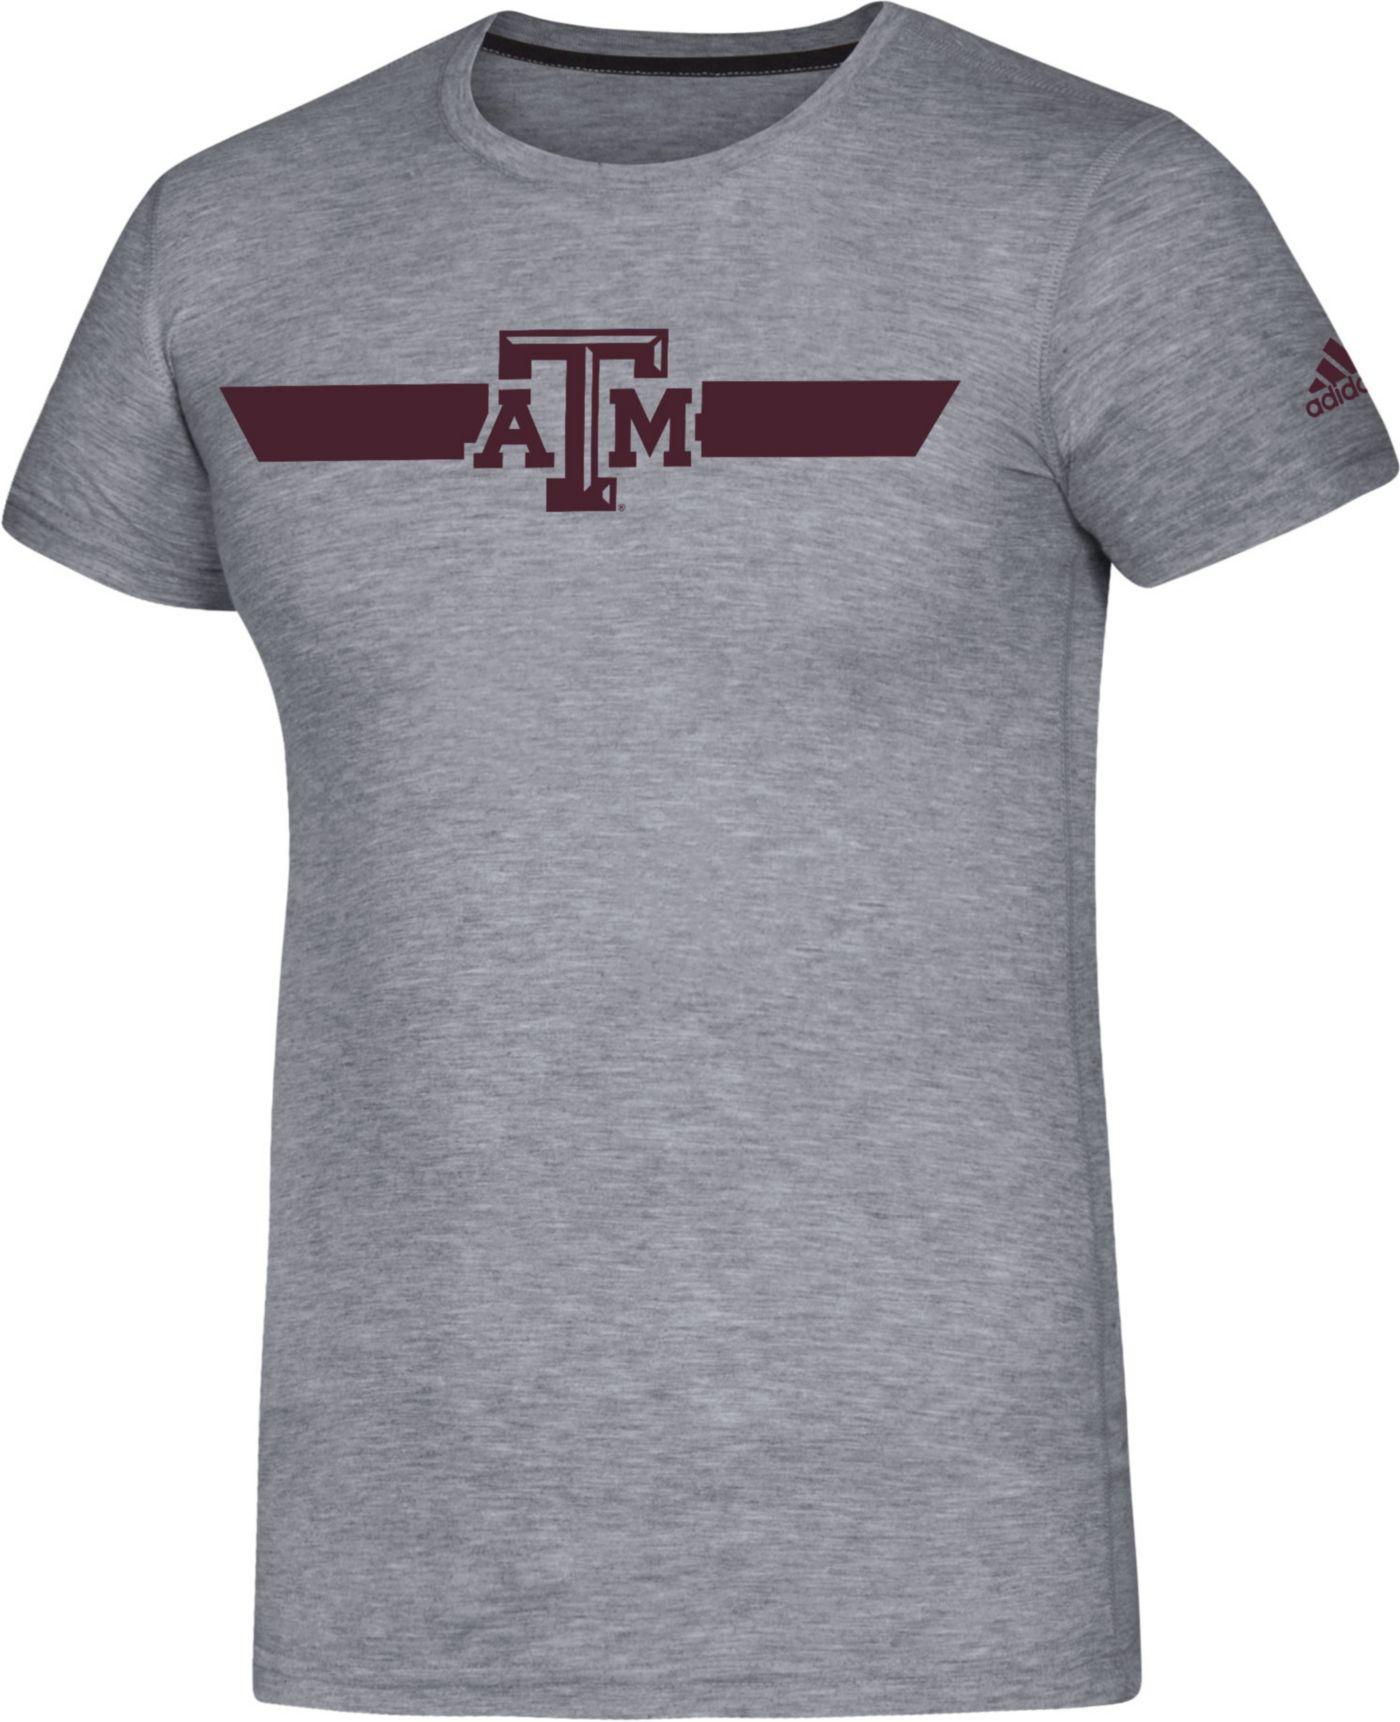 adidas Men's Texas A&M Aggies Grey Locker Stripe Sideline T-Shirt